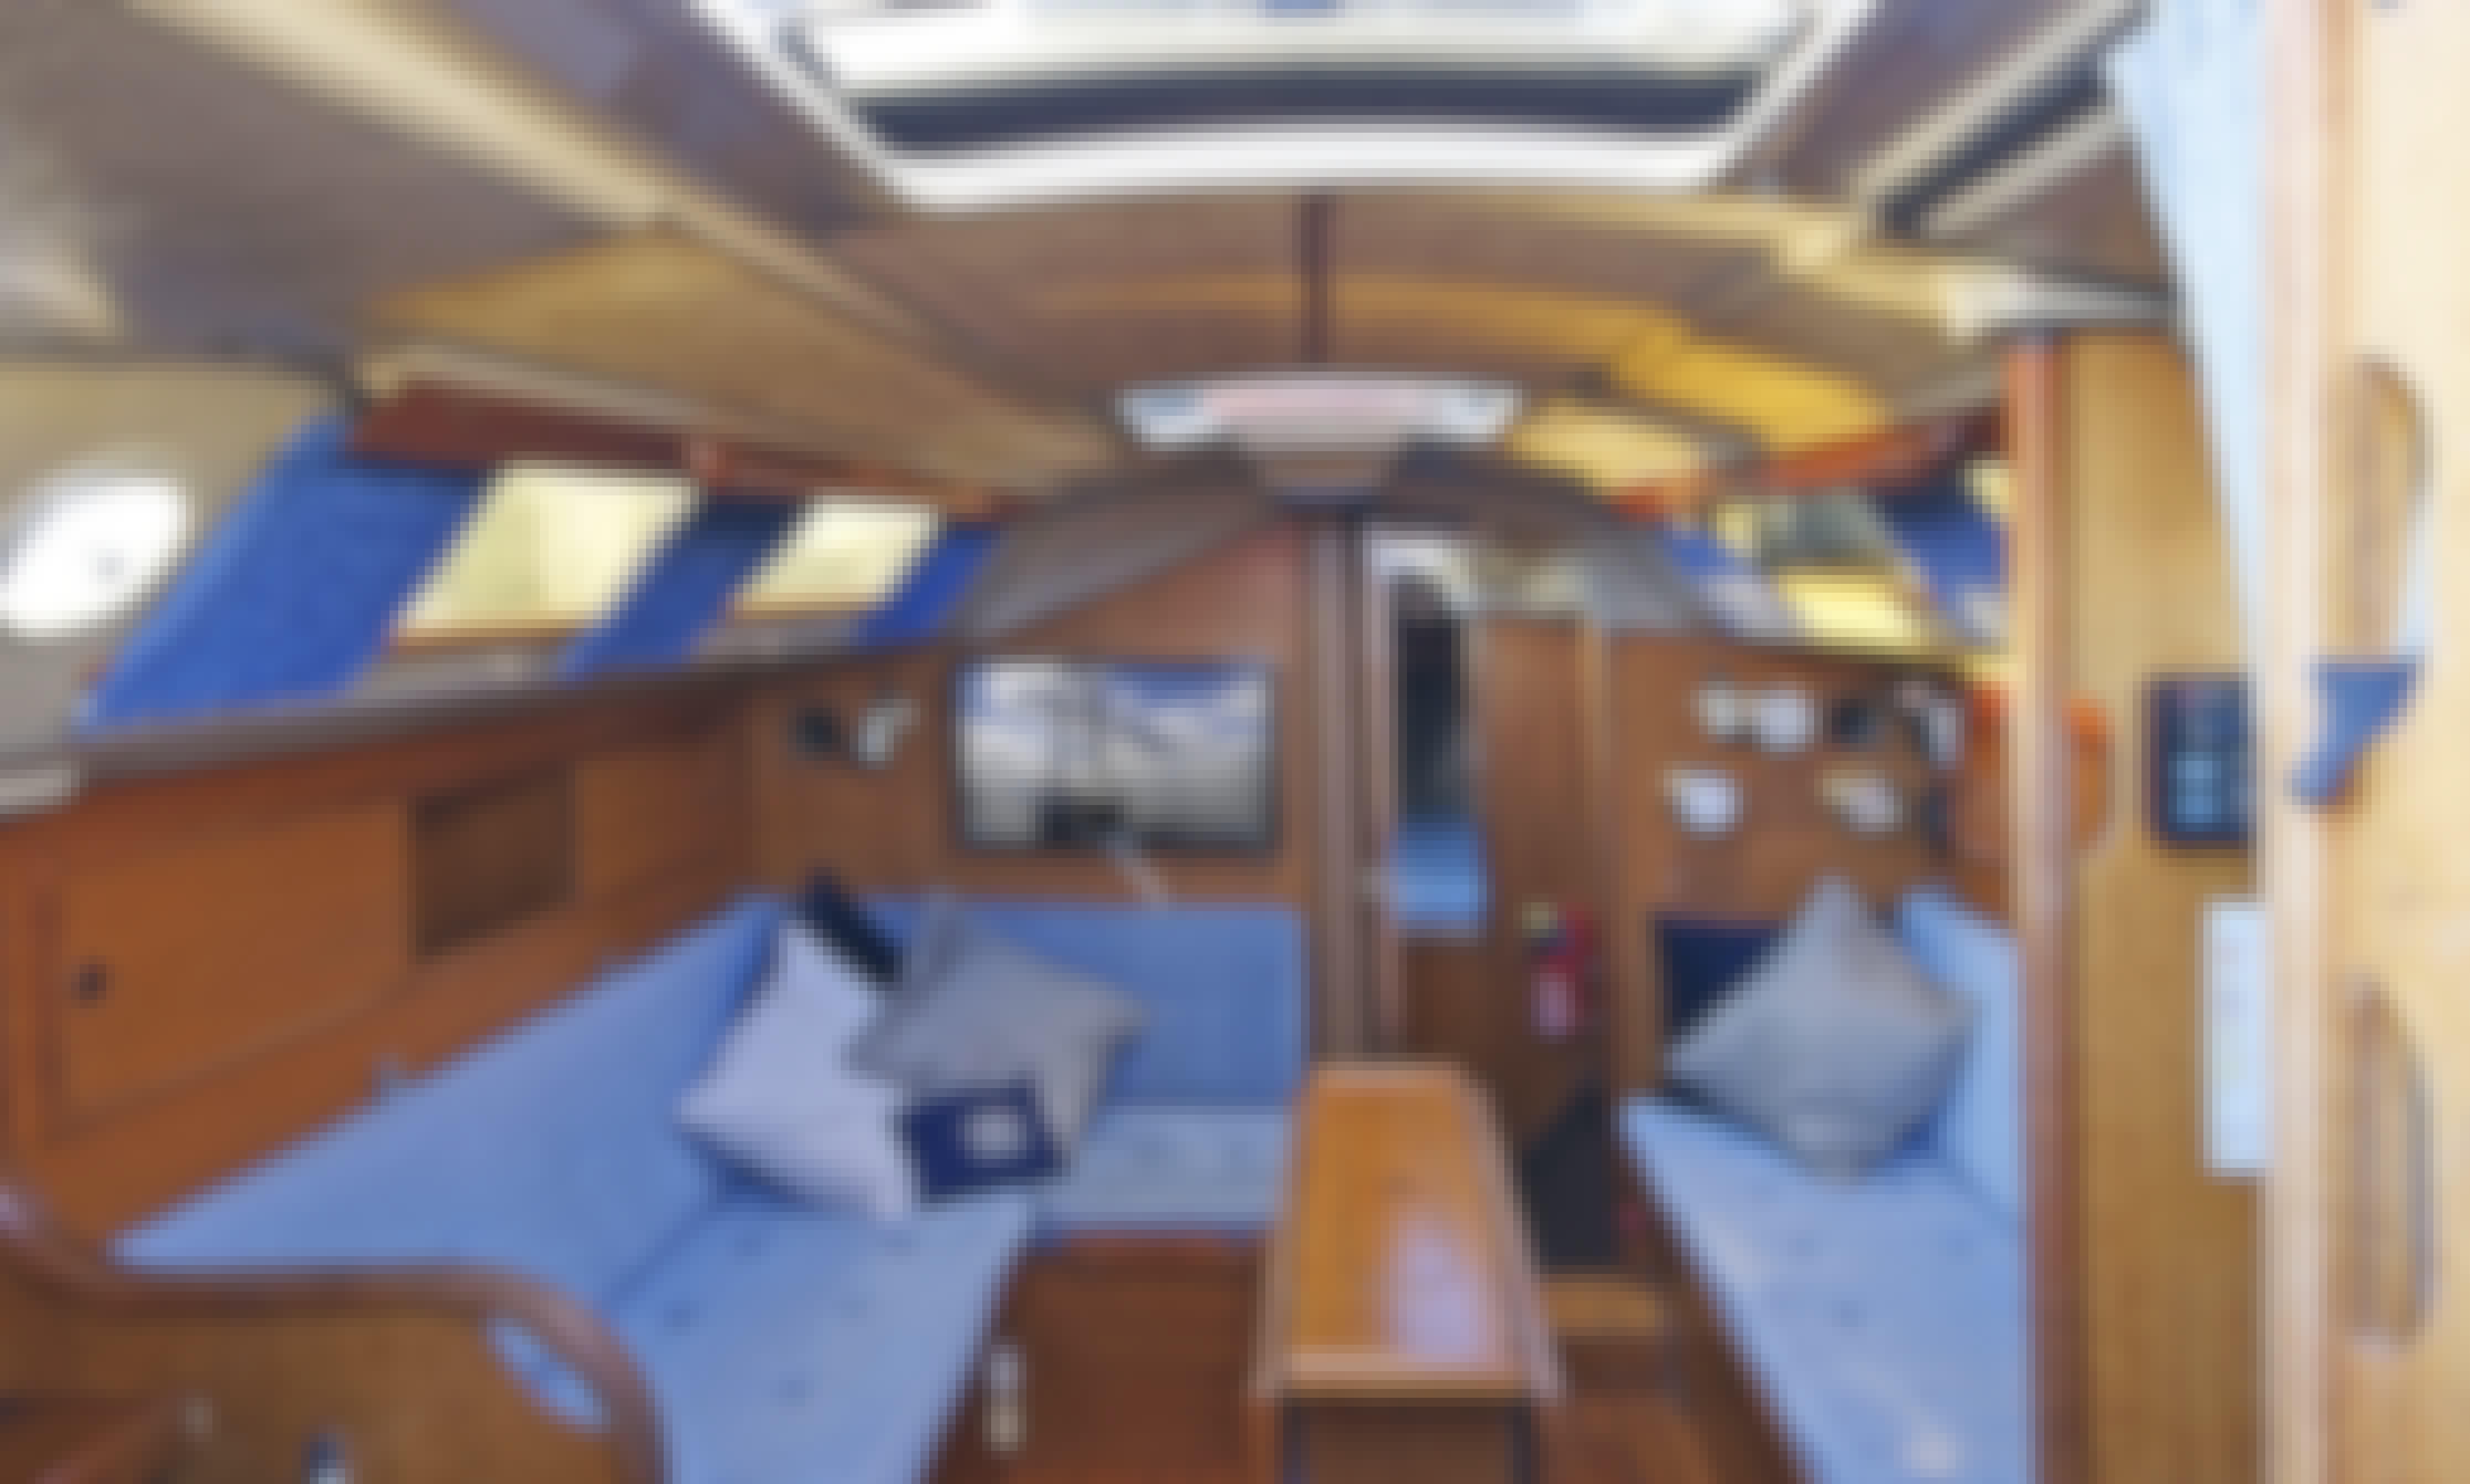 IRS CHALLENGER (Ex. SAILFISHER), Cruising Monohull rental in Gdańsk